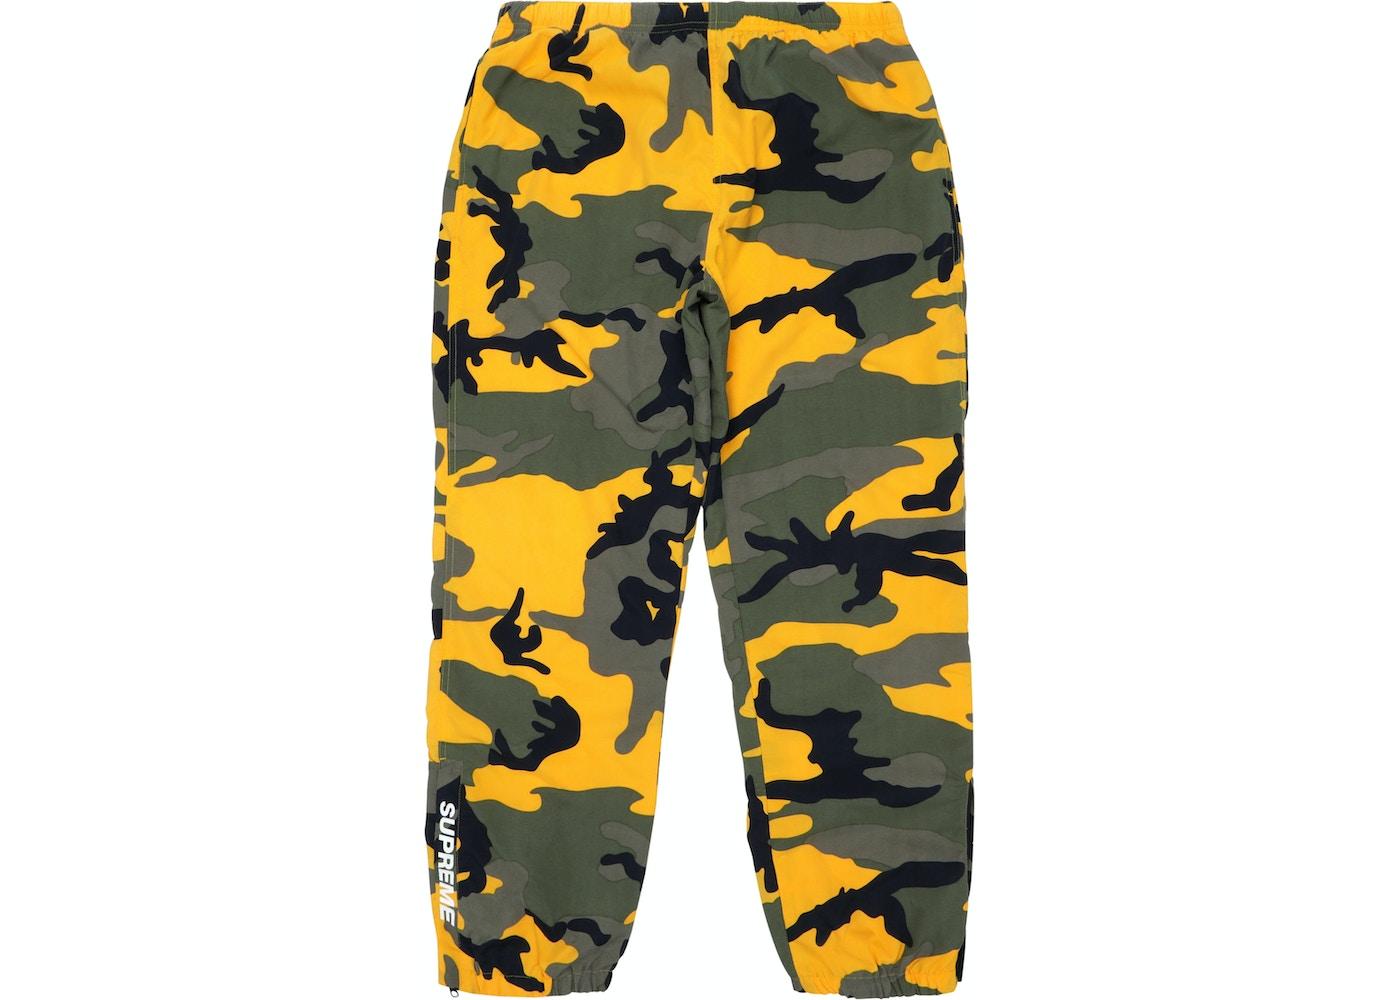 Supreme Warm Up Pant Yellow Camo - FW17